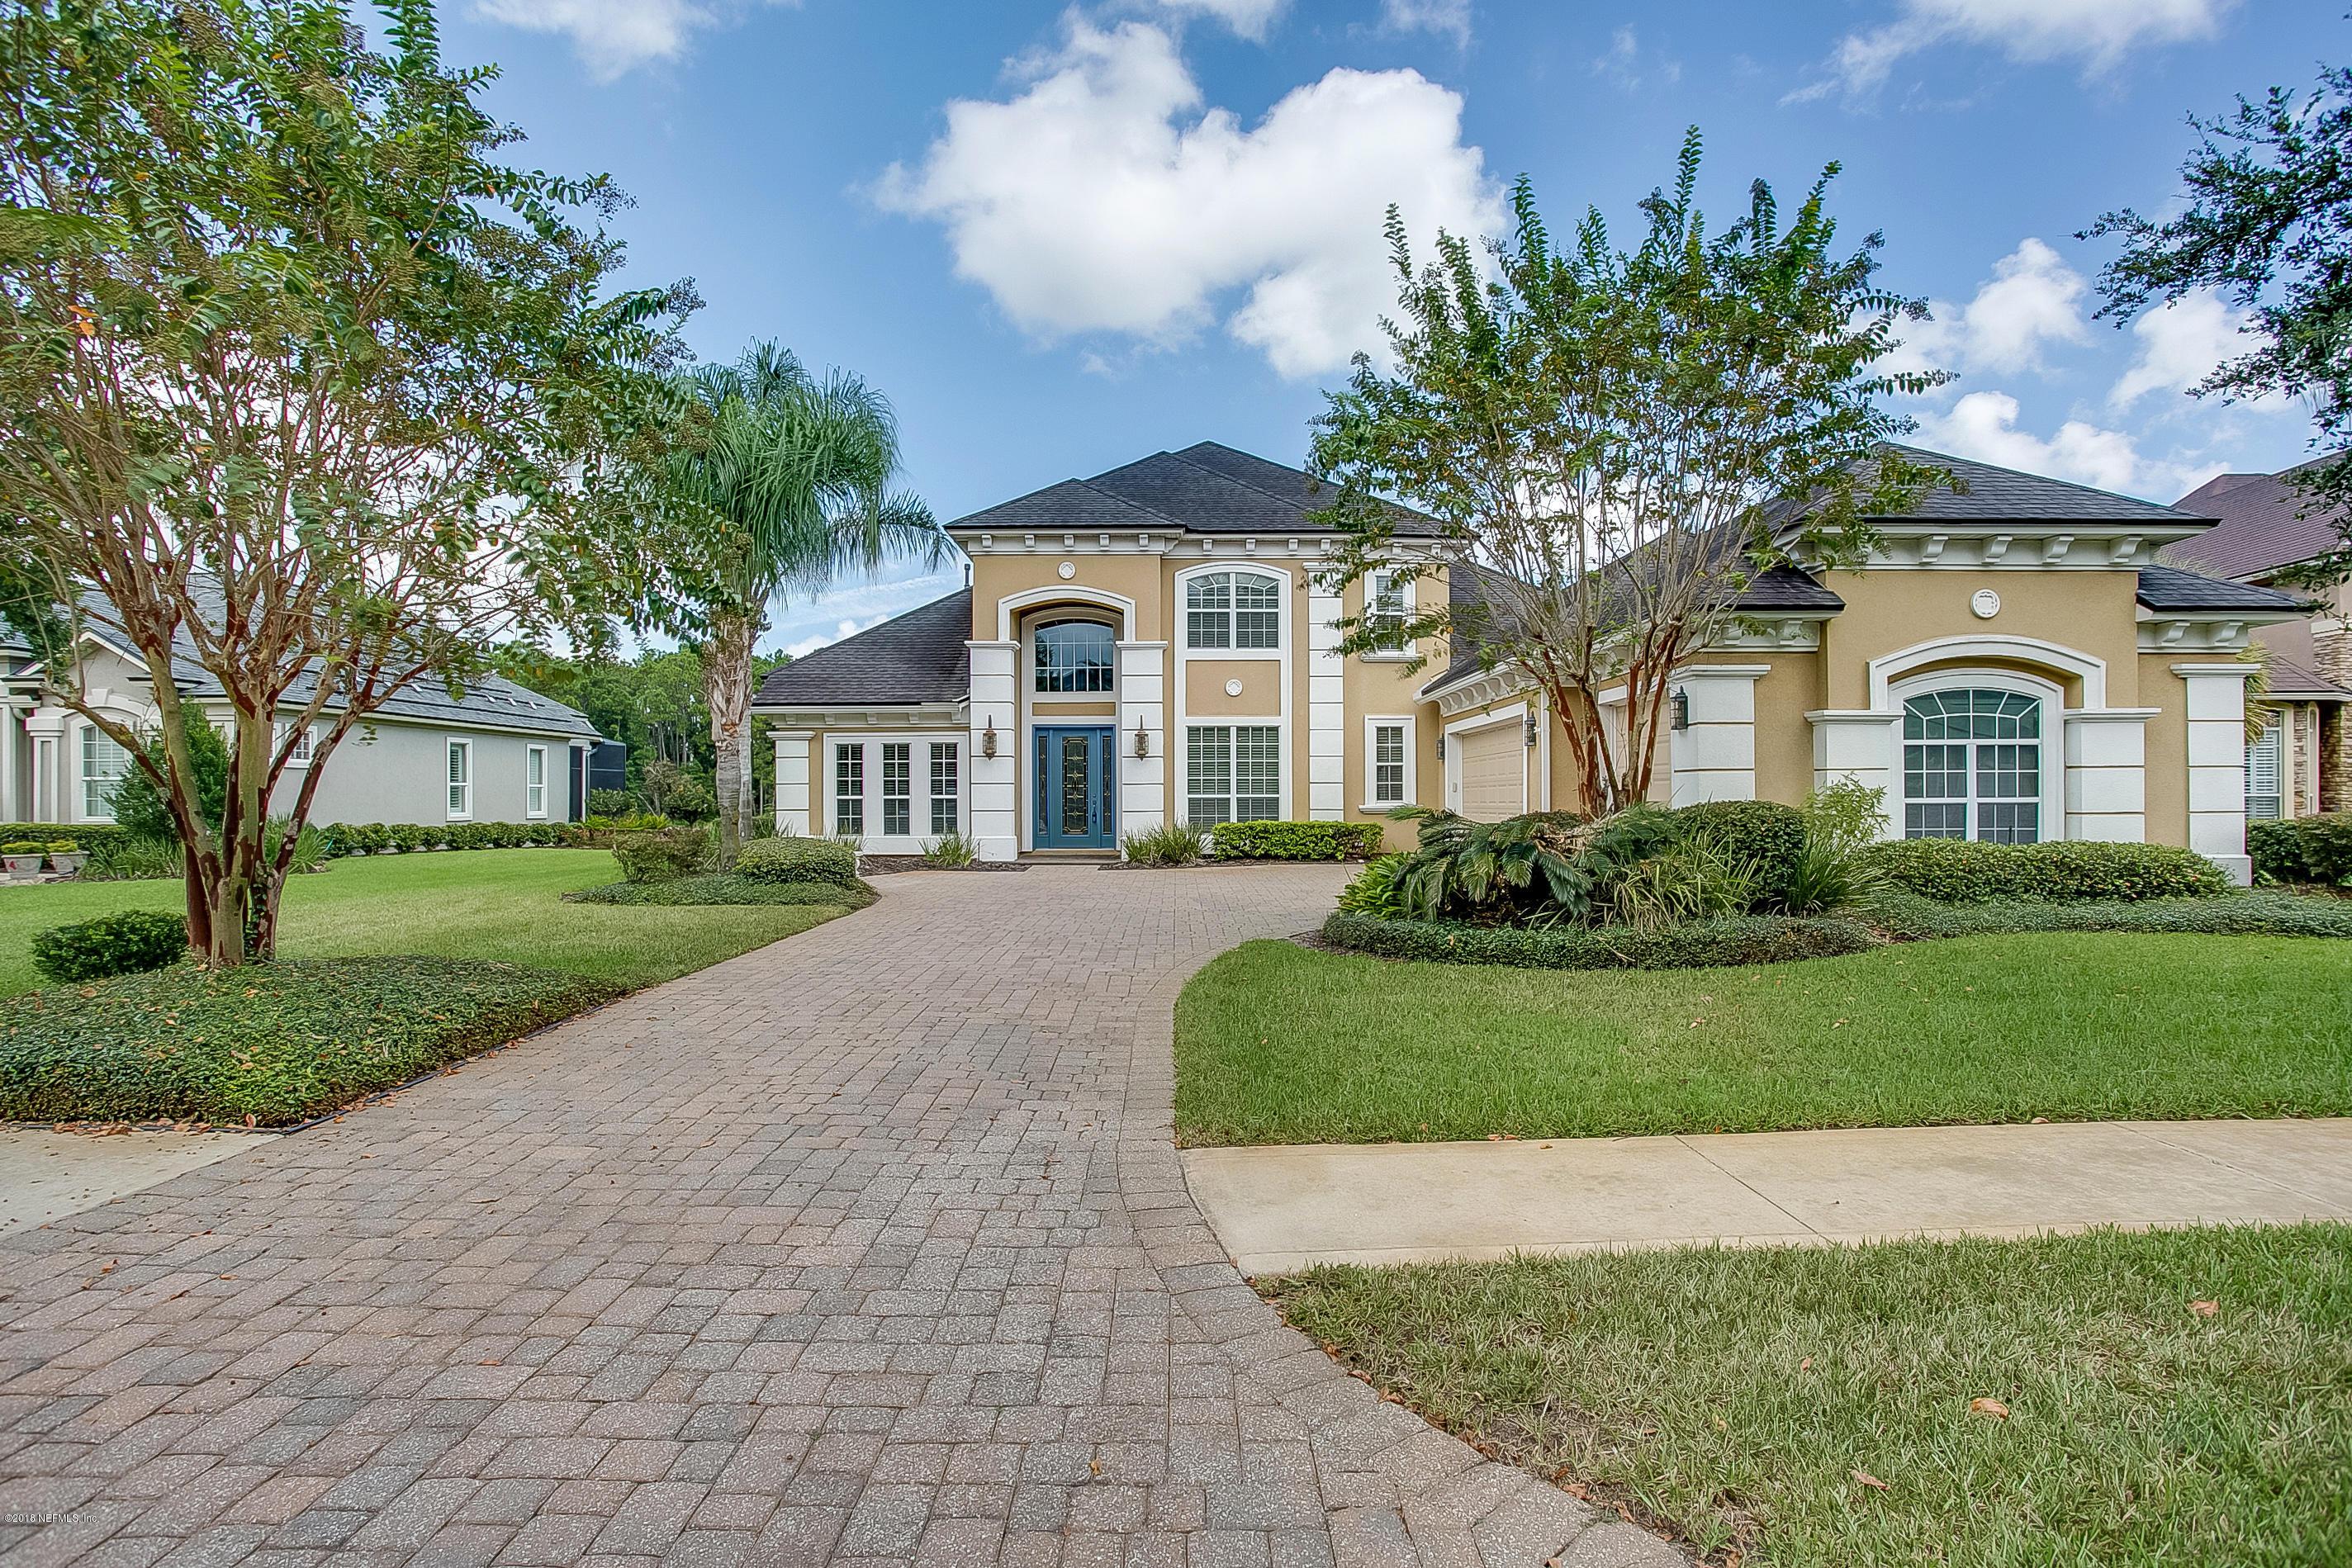 452 SEBASTIAN, ST AUGUSTINE, FLORIDA 32095, 5 Bedrooms Bedrooms, ,4 BathroomsBathrooms,Residential - single family,For sale,SEBASTIAN,957461